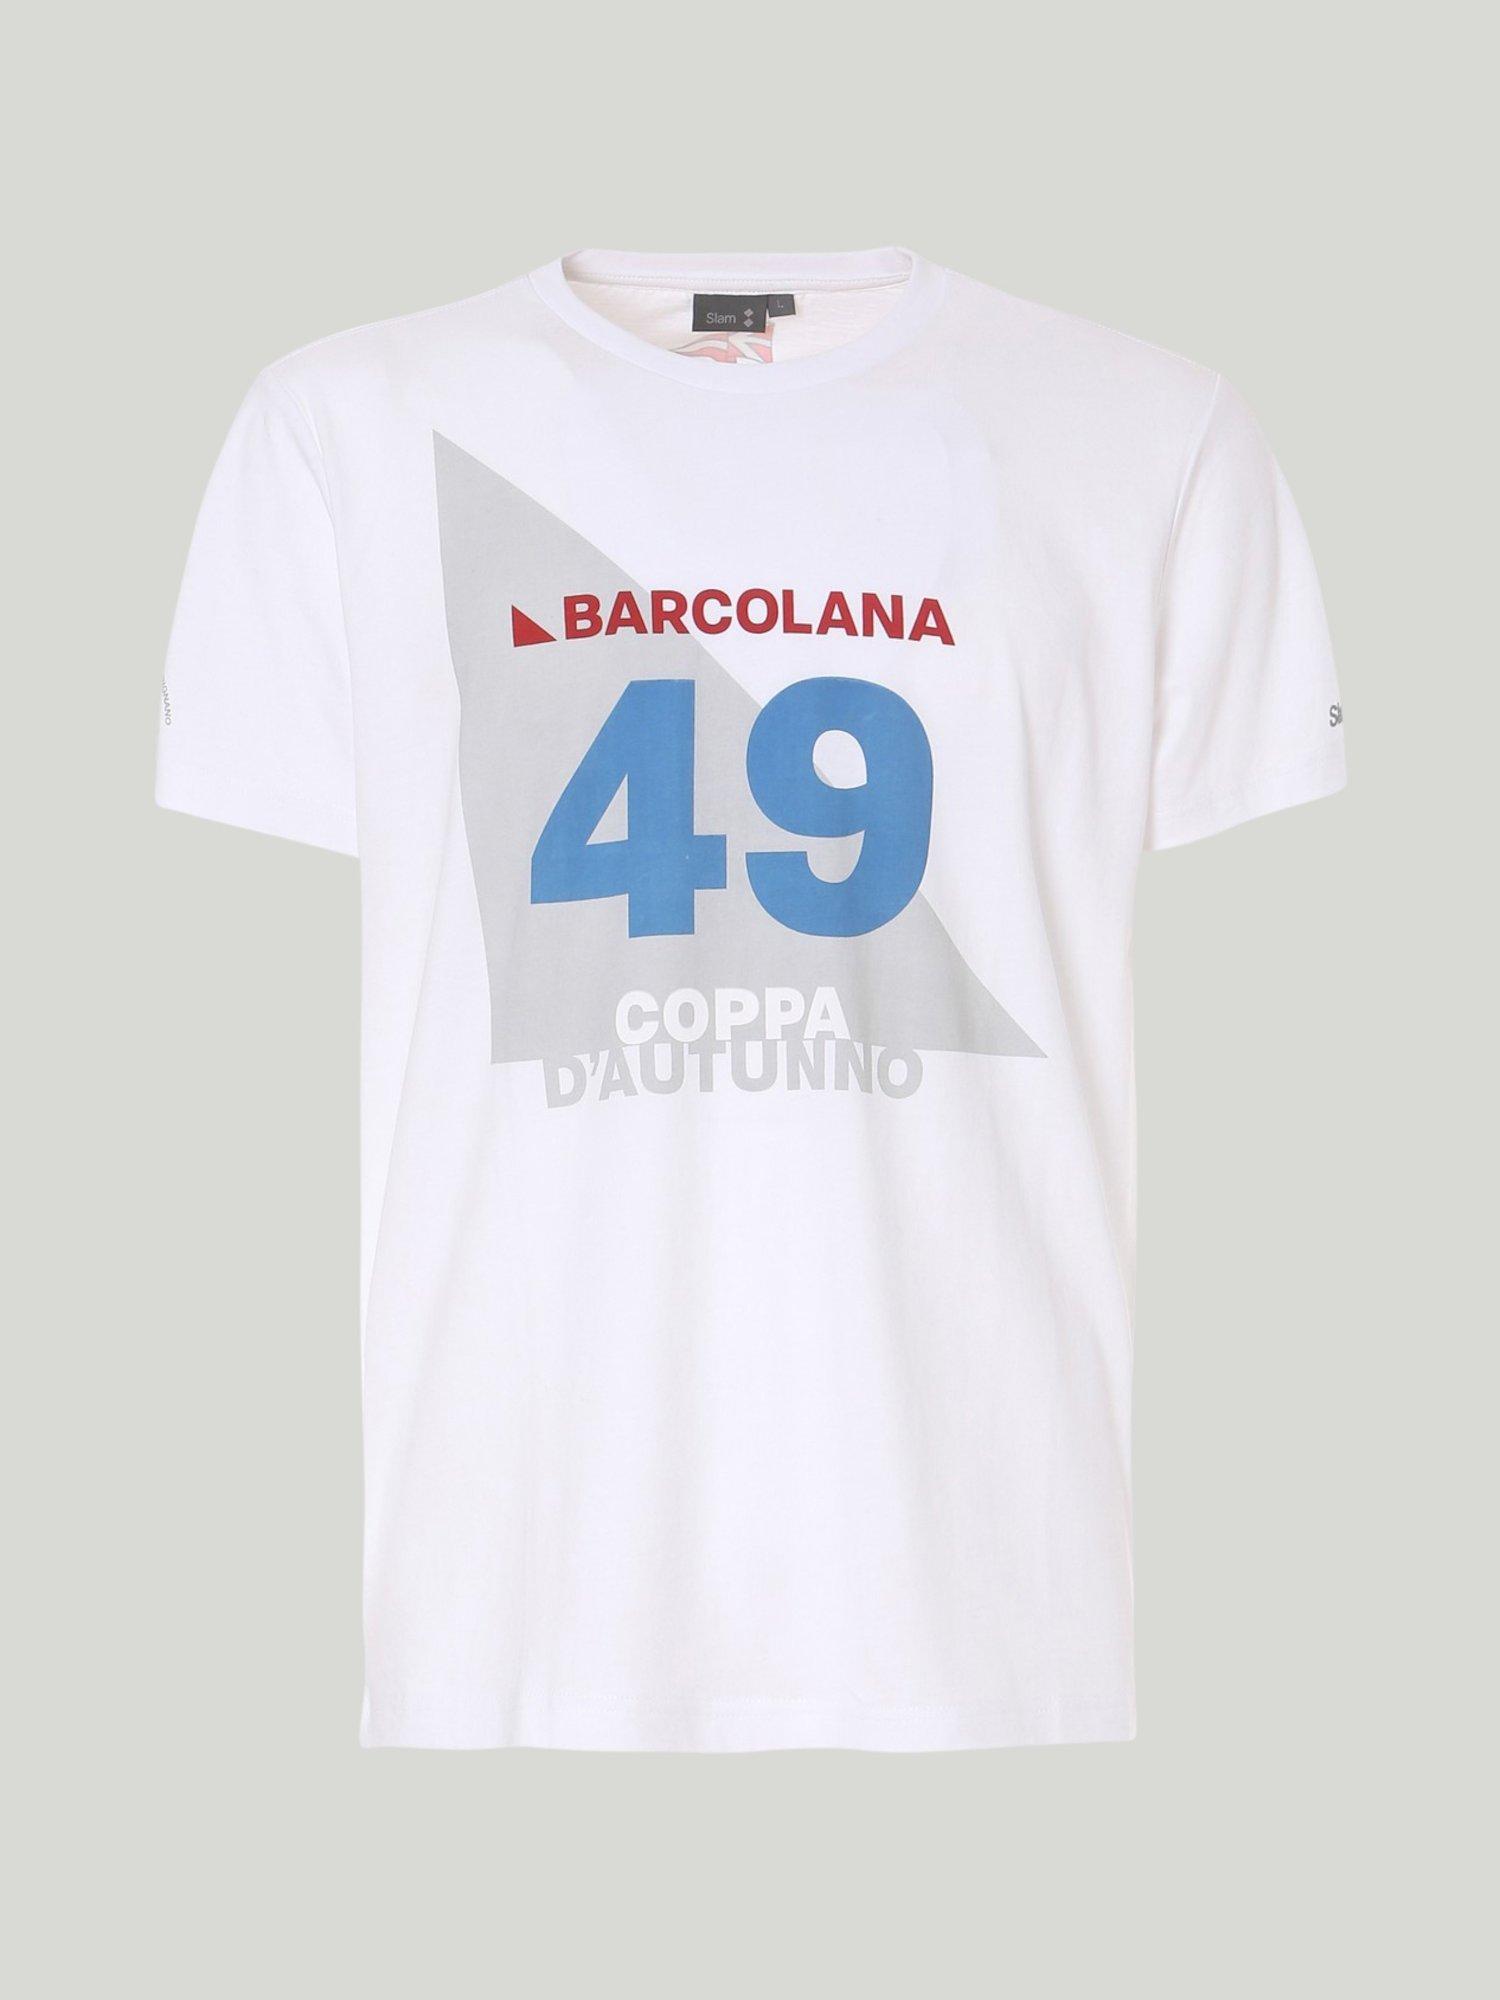 Camiseta 49 Barcolana - Blanco